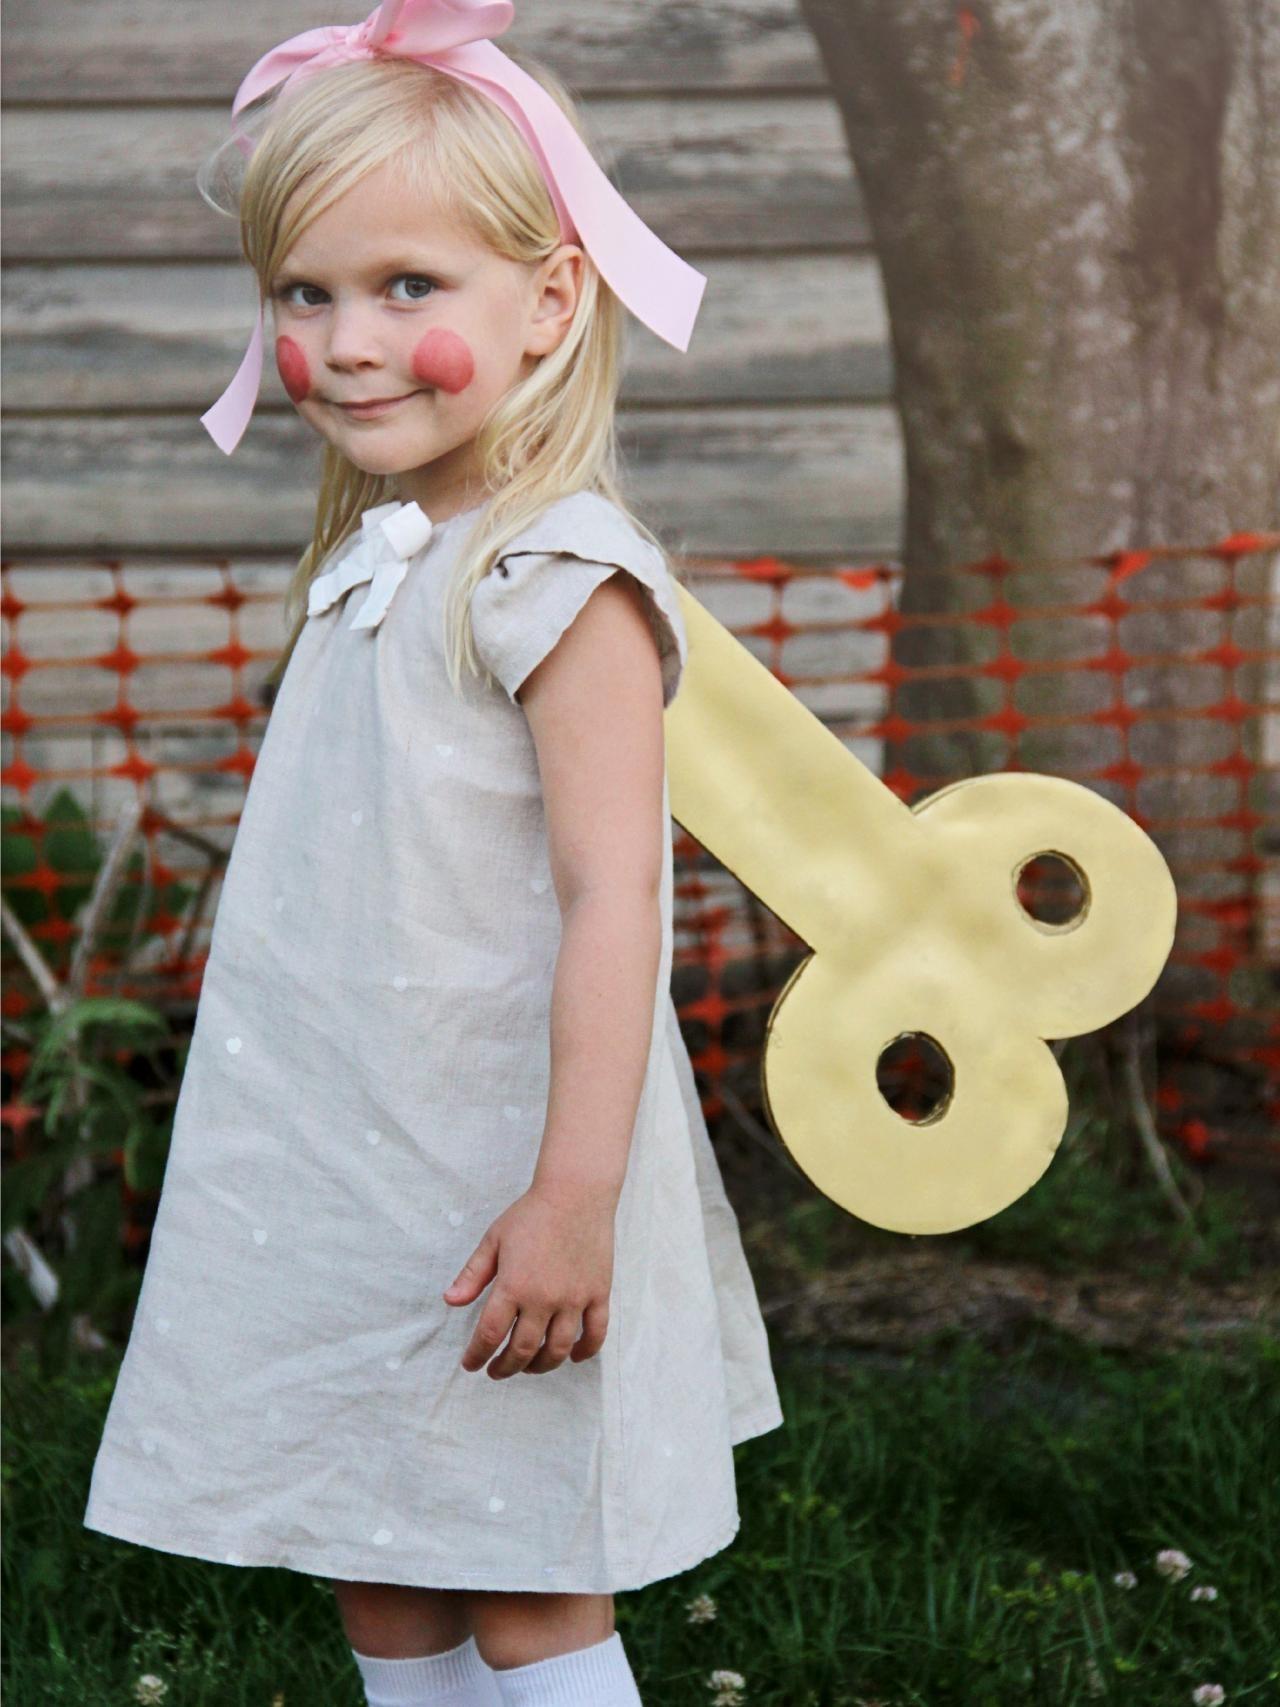 10 Fashionable Little Girl Halloween Costume Ideas %name 2020